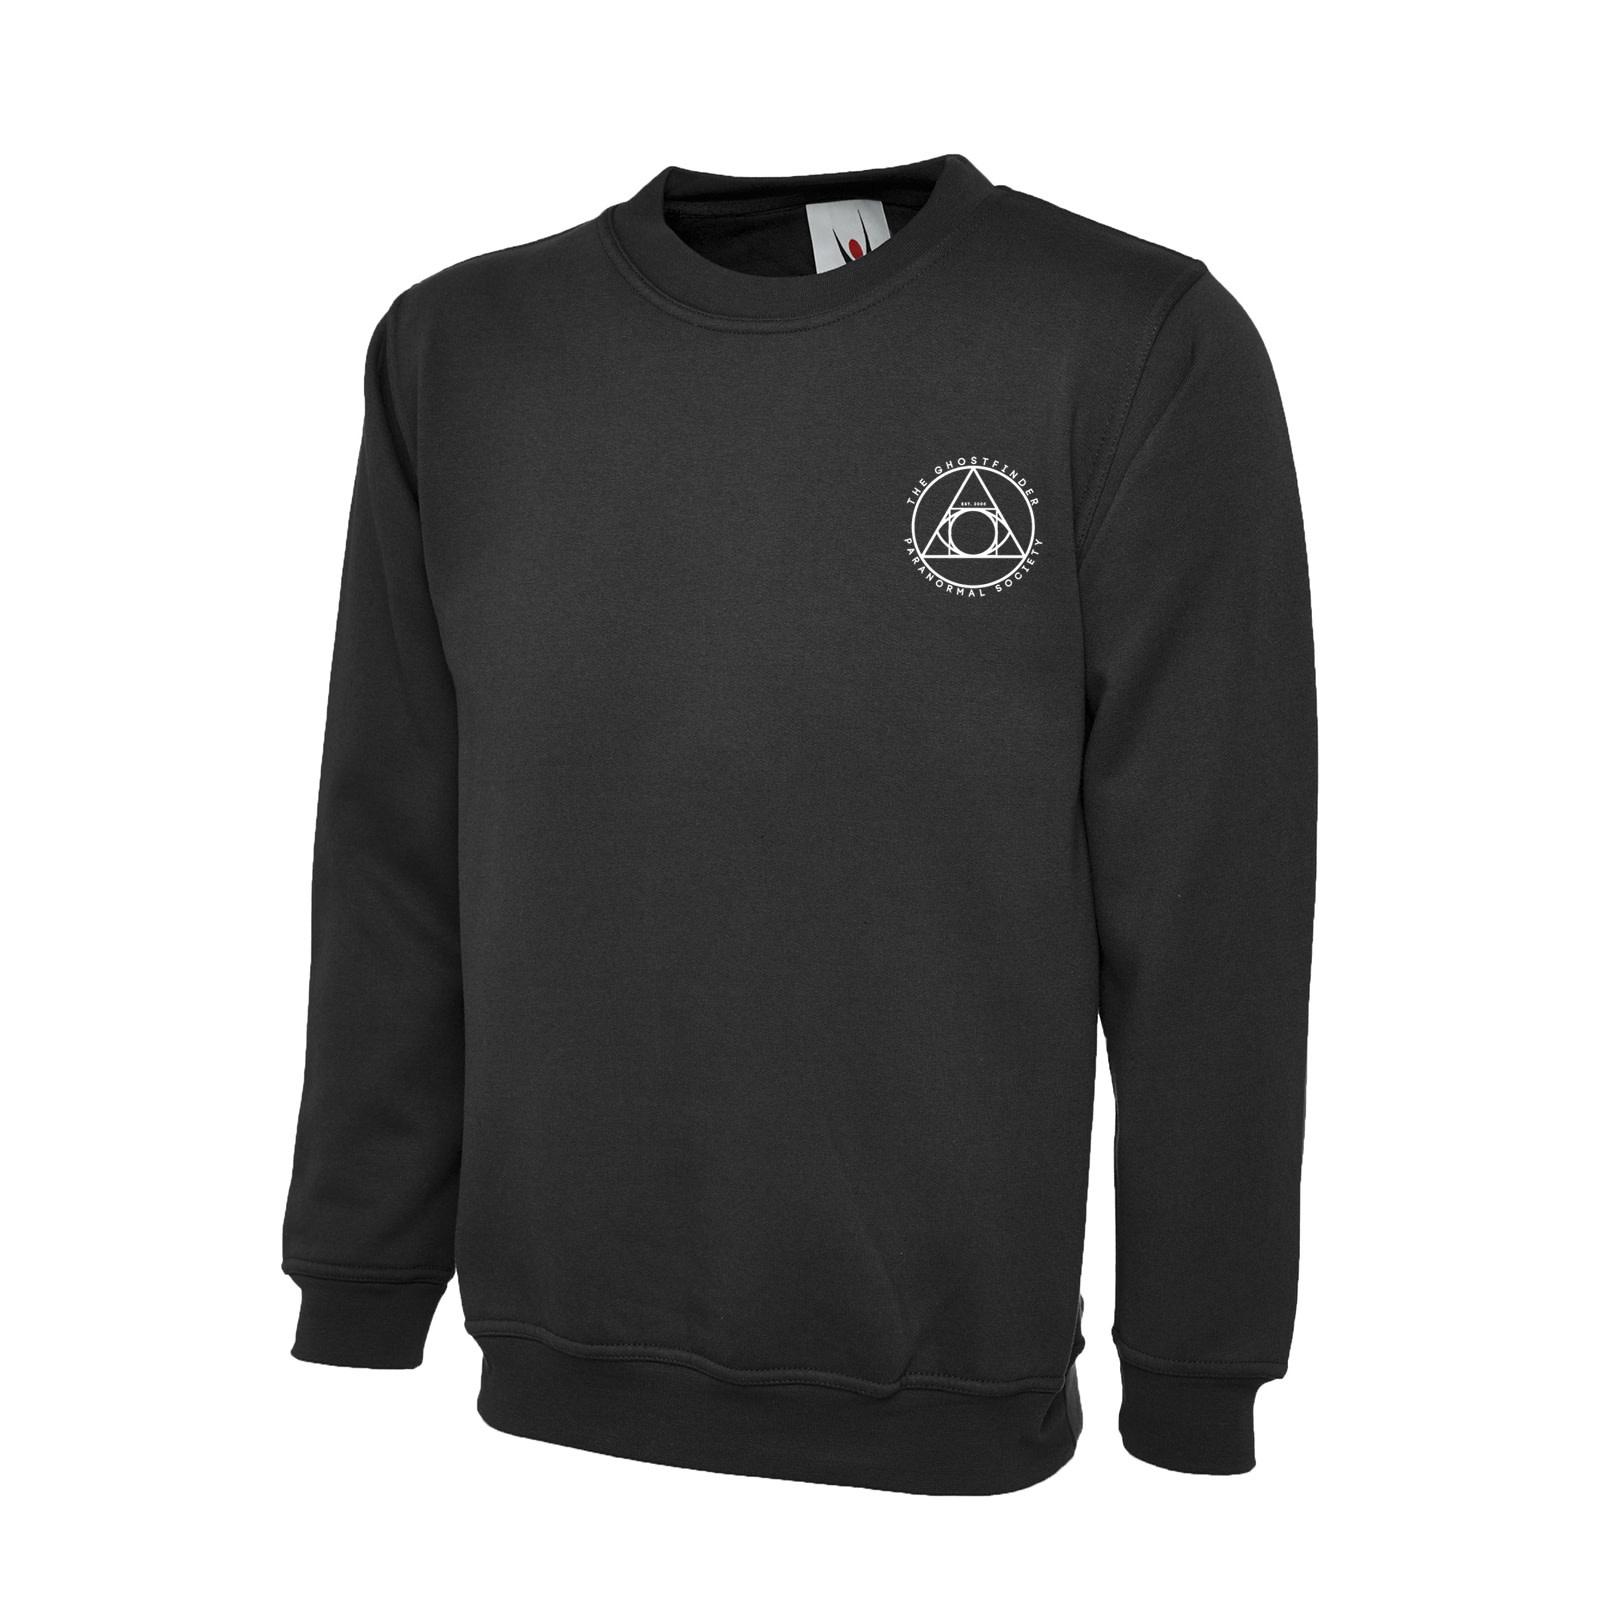 The Ghostfinder Paranormal Society Sweatshirt